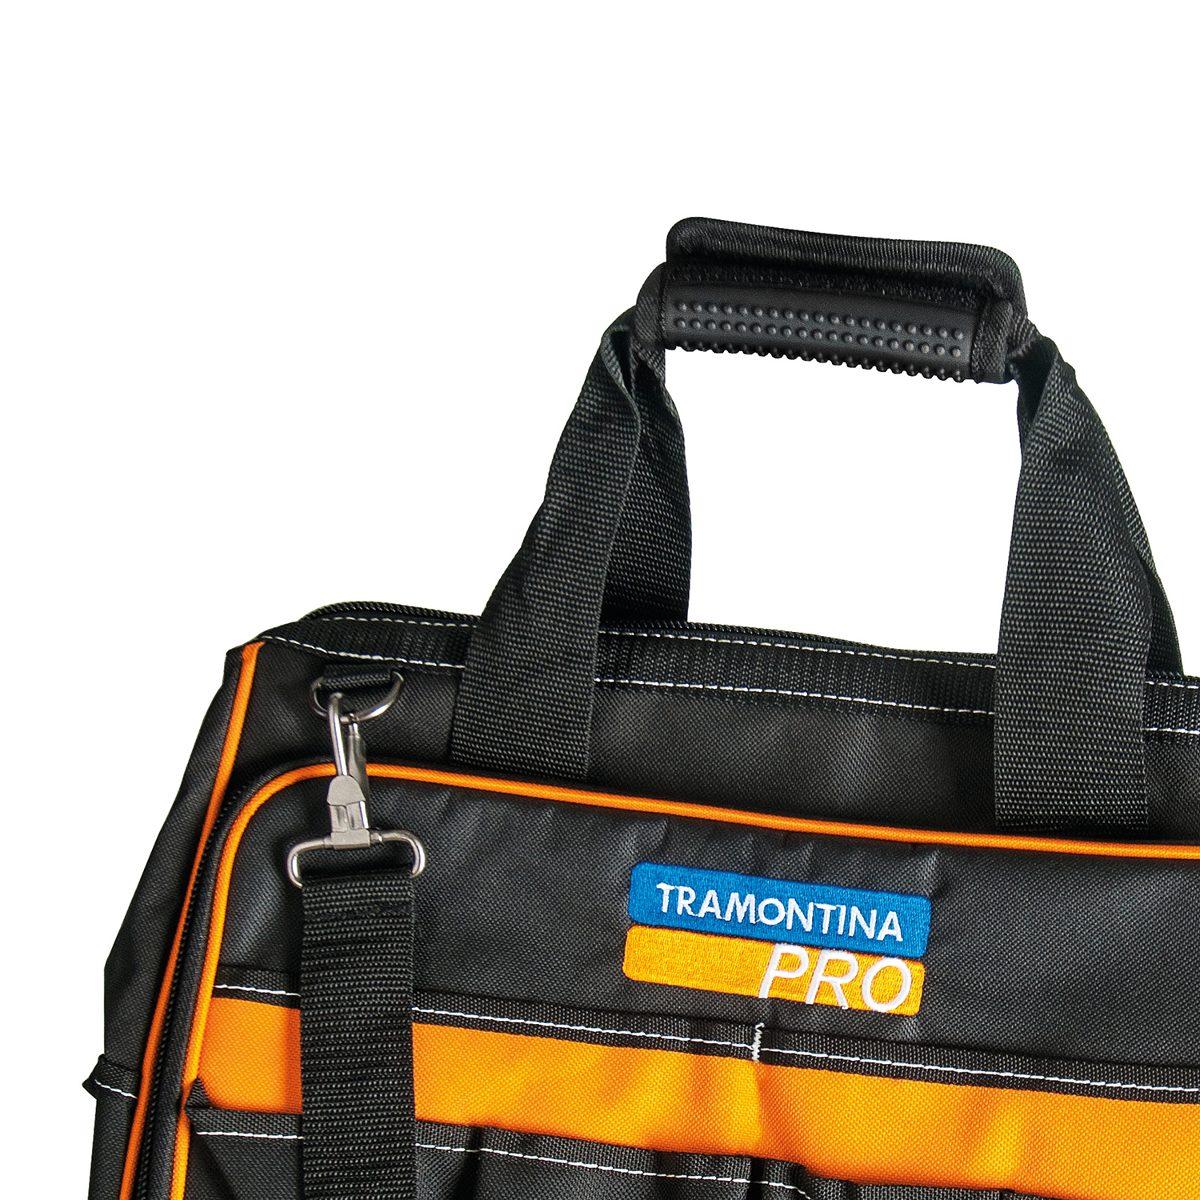 bolsa para ferramentas nylon c  24 bolsos tramontina pro. Carregando zoom. 7983b98941d